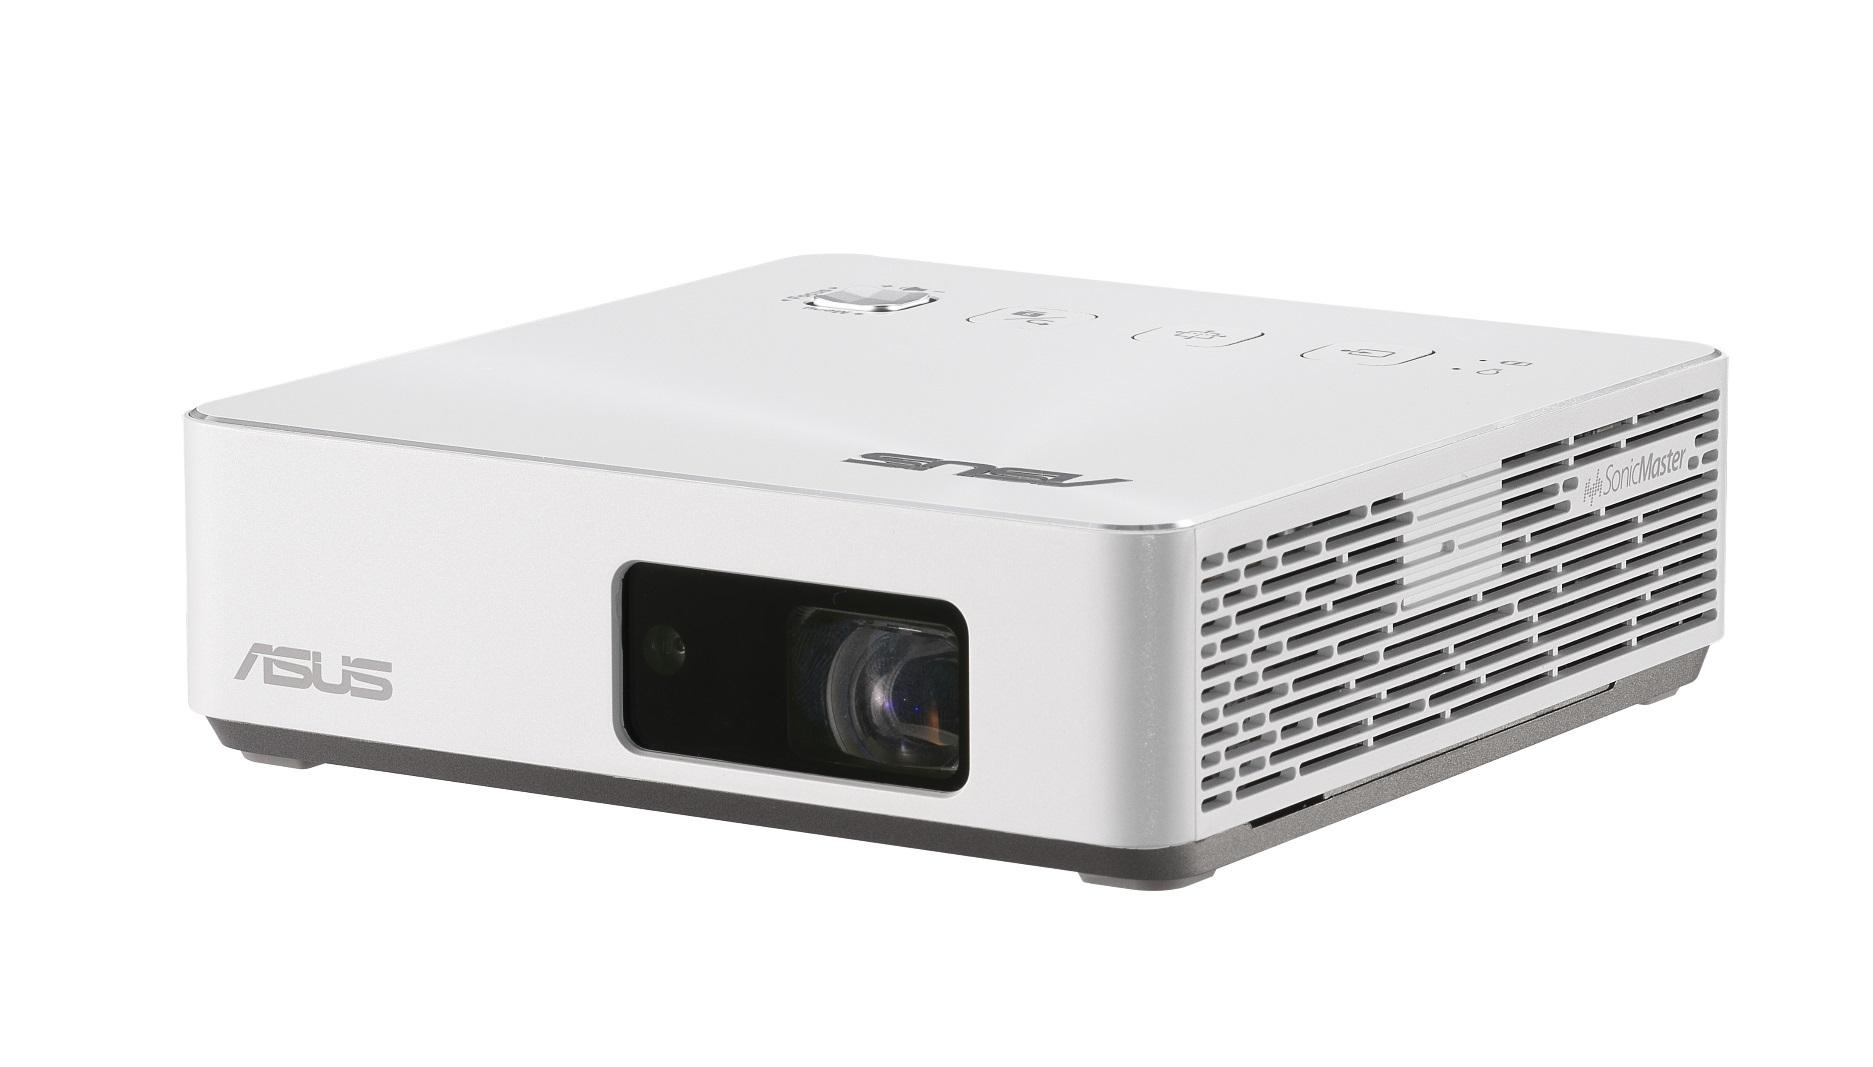 ASUS ZenBeam S2推出珍珠白新色,不論是一公尺內的短焦投影,抑或大螢幕的居家視界需求,皆能盡享劇院級視聽娛樂饗宴。